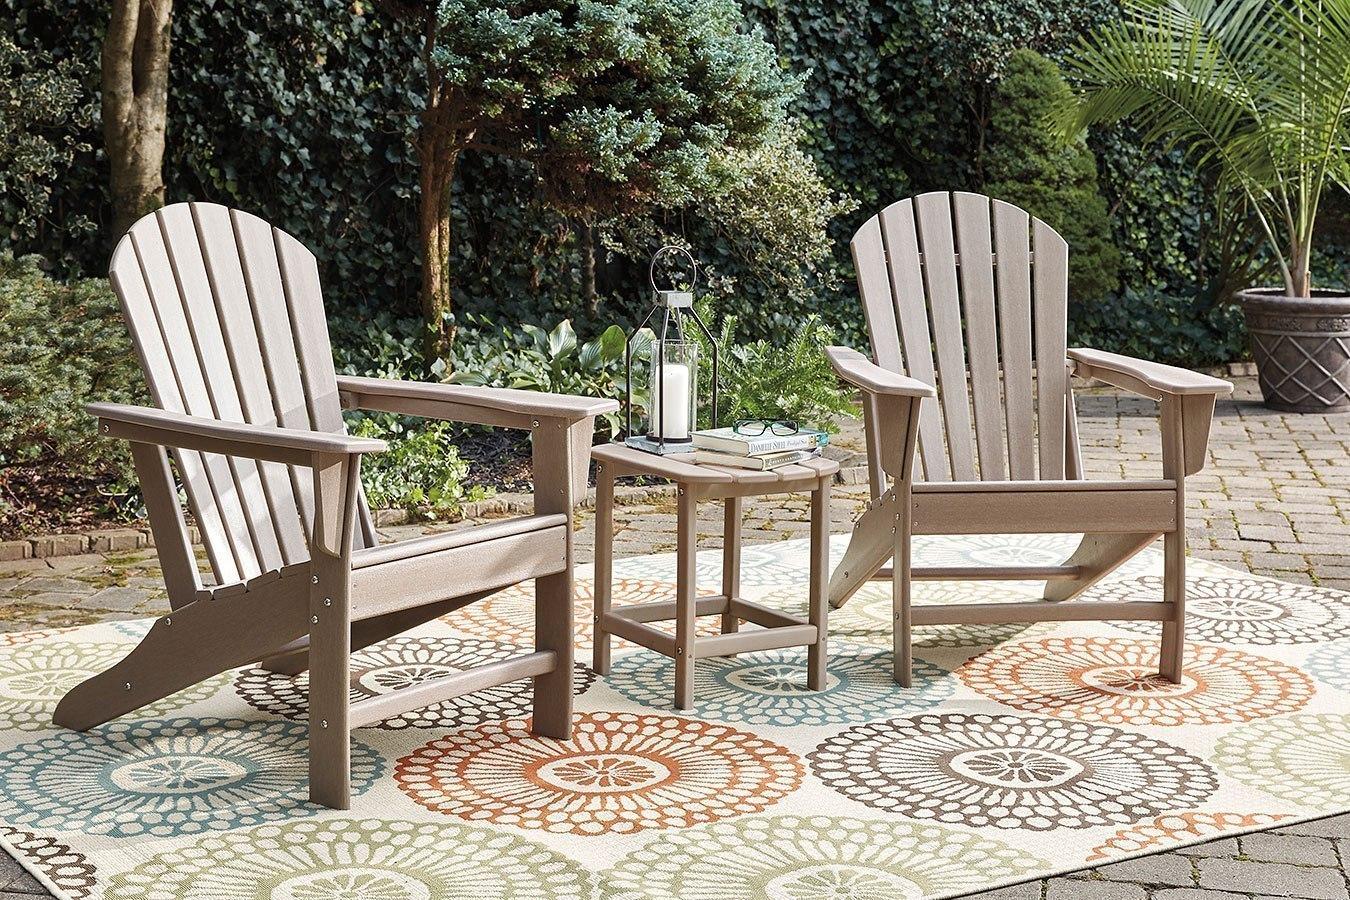 Sundown treasure outdoor seating set grayish brown signature design furniture cart